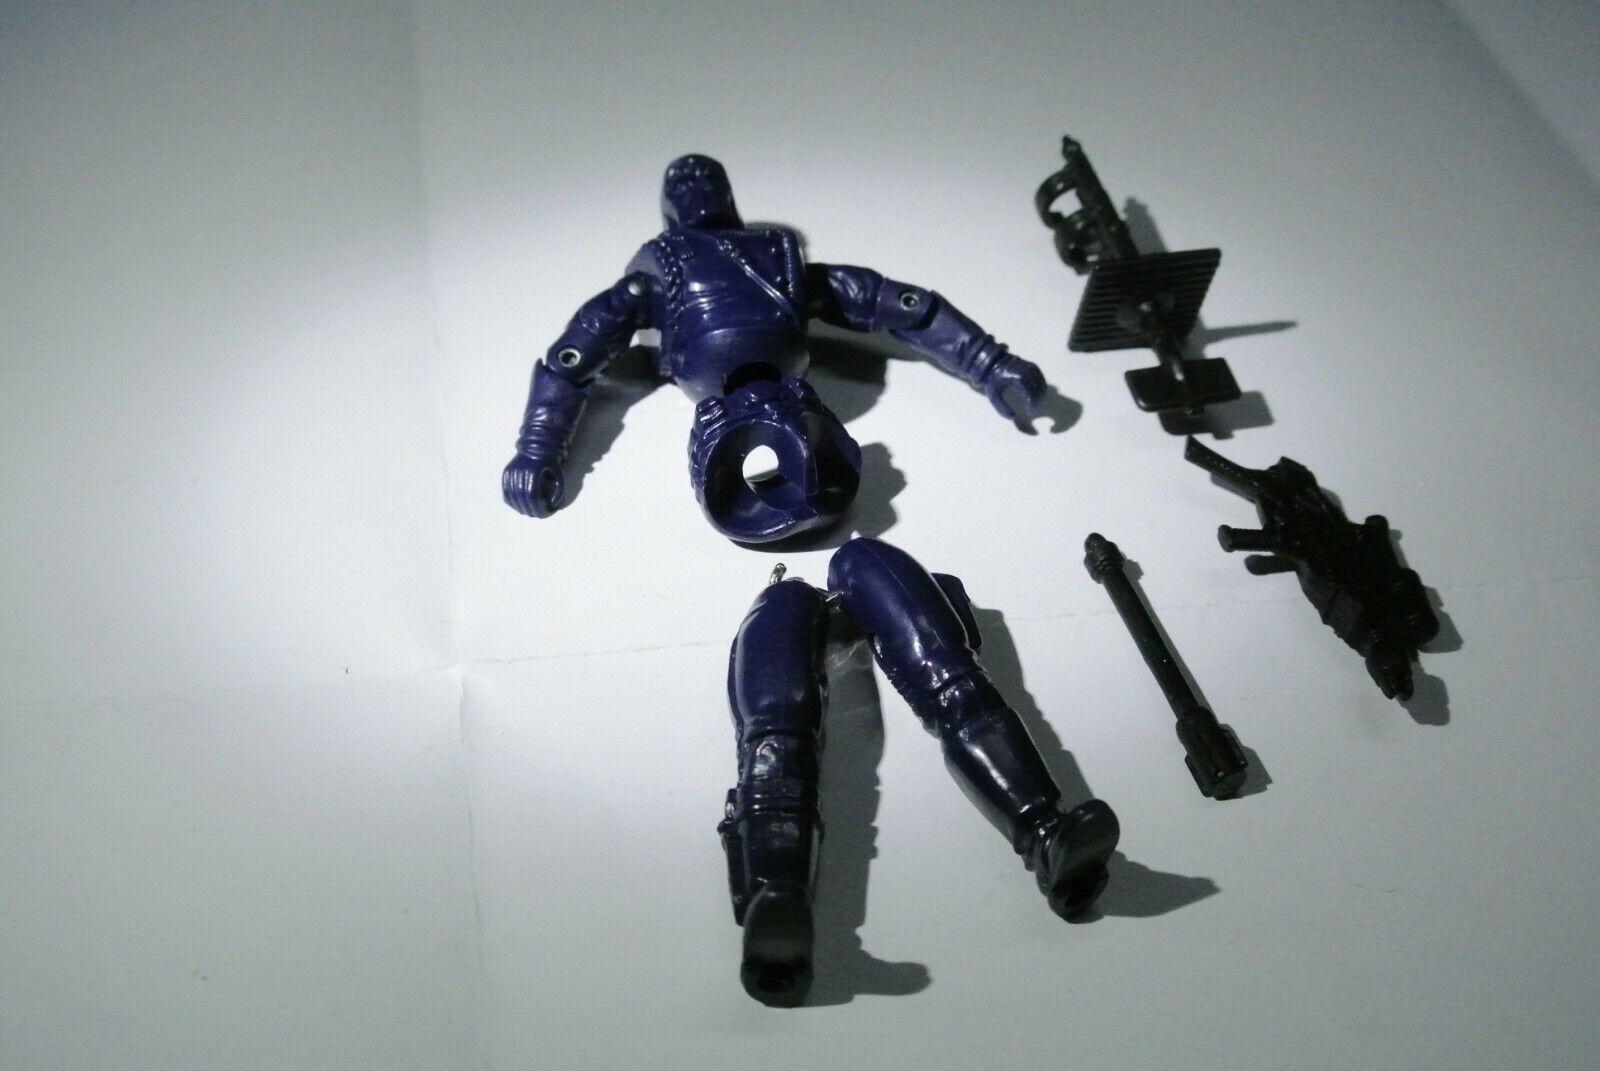 1991 Hasbro GI  Joe Cobra comhommeder test shot prougeotype factory sample figure  sports chauds